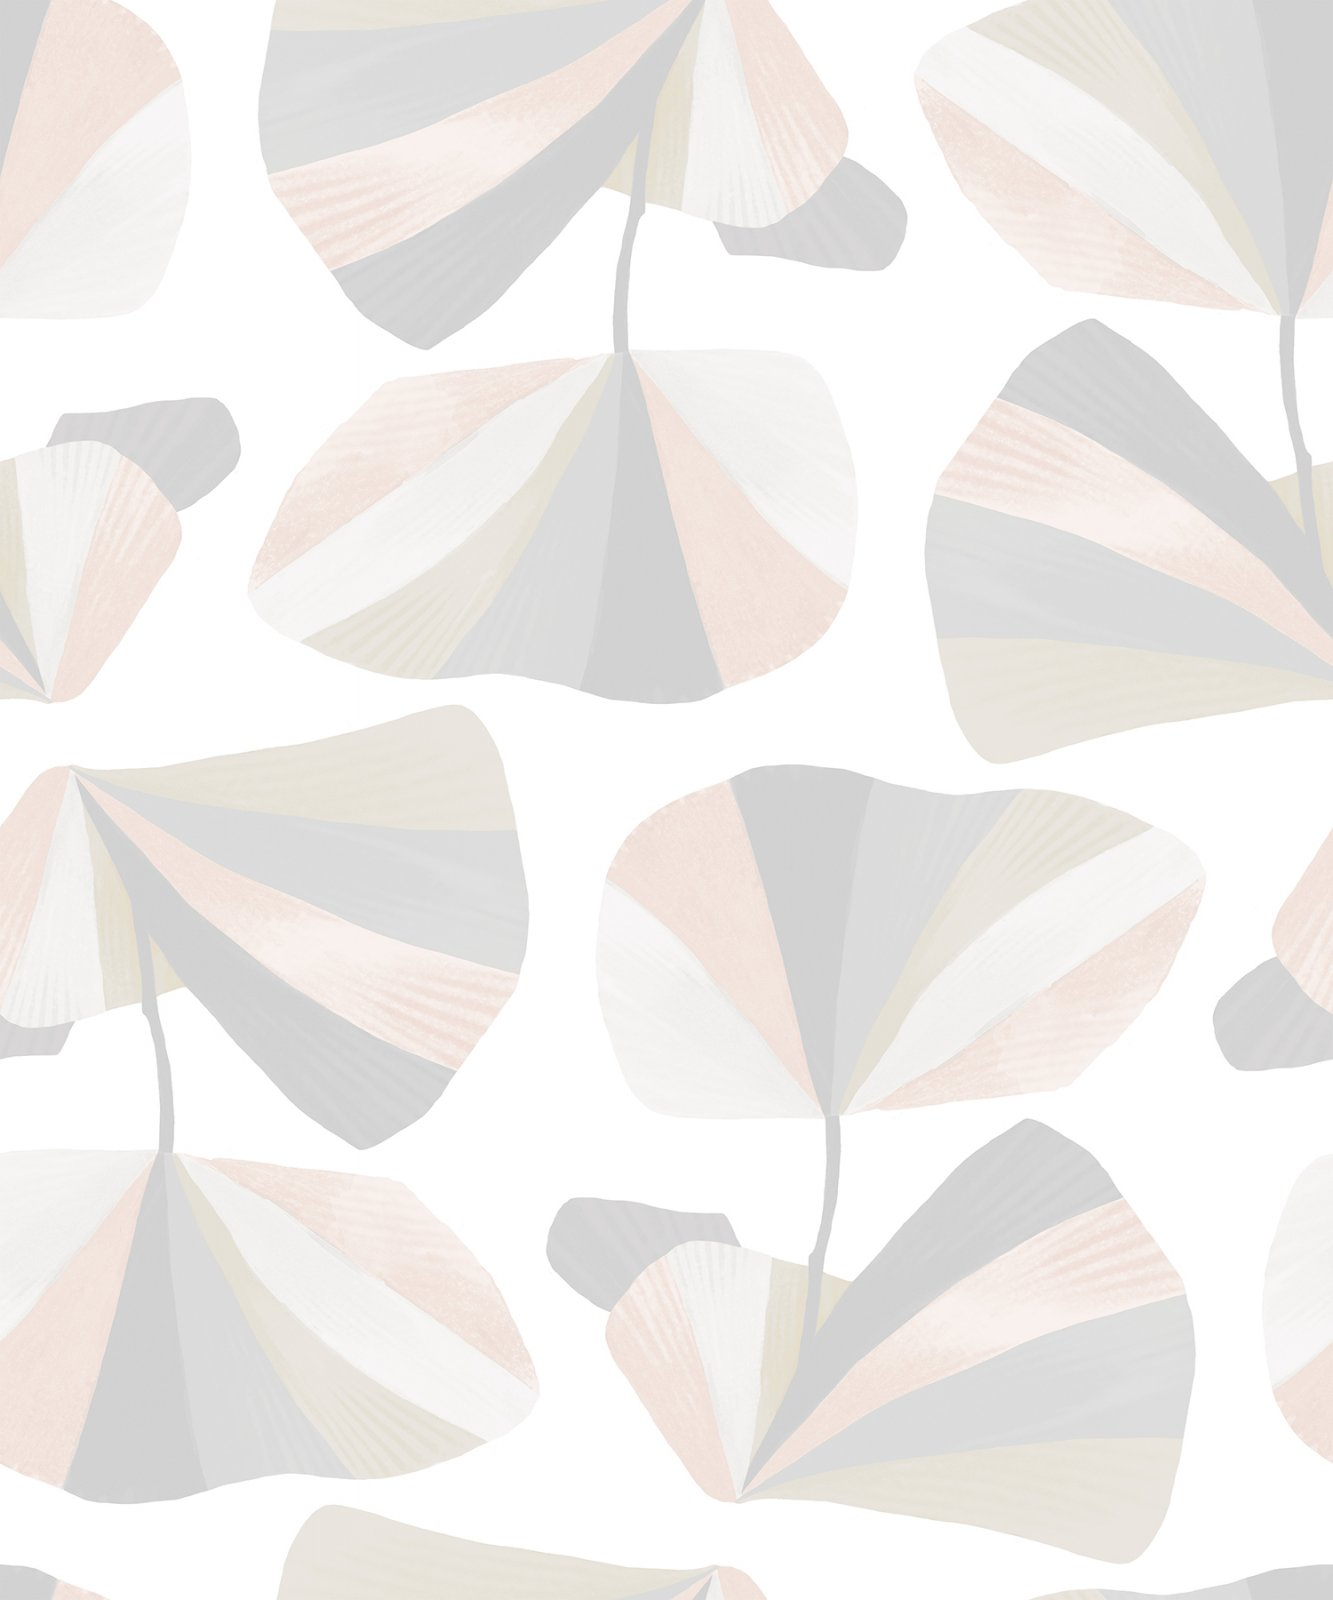 Cold Press In Bloom - In Bloom - Soft White